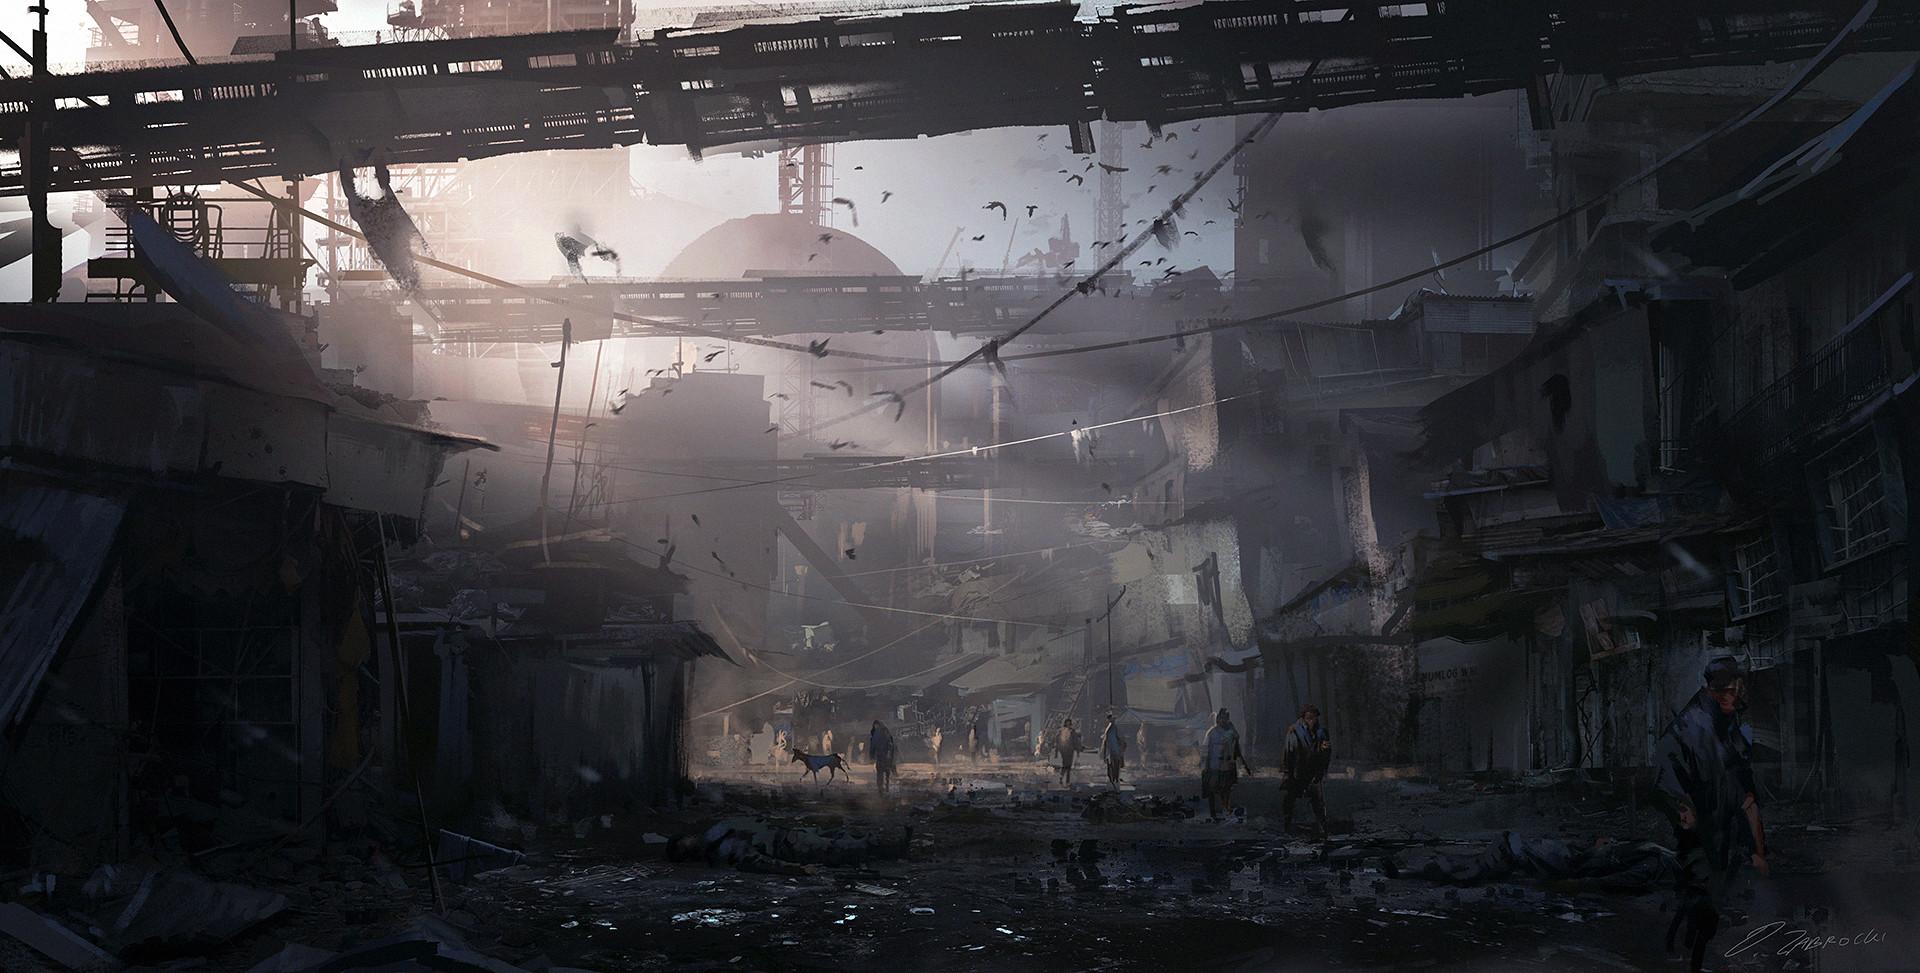 darek-zabrocki-slums-final-darekzabrocki